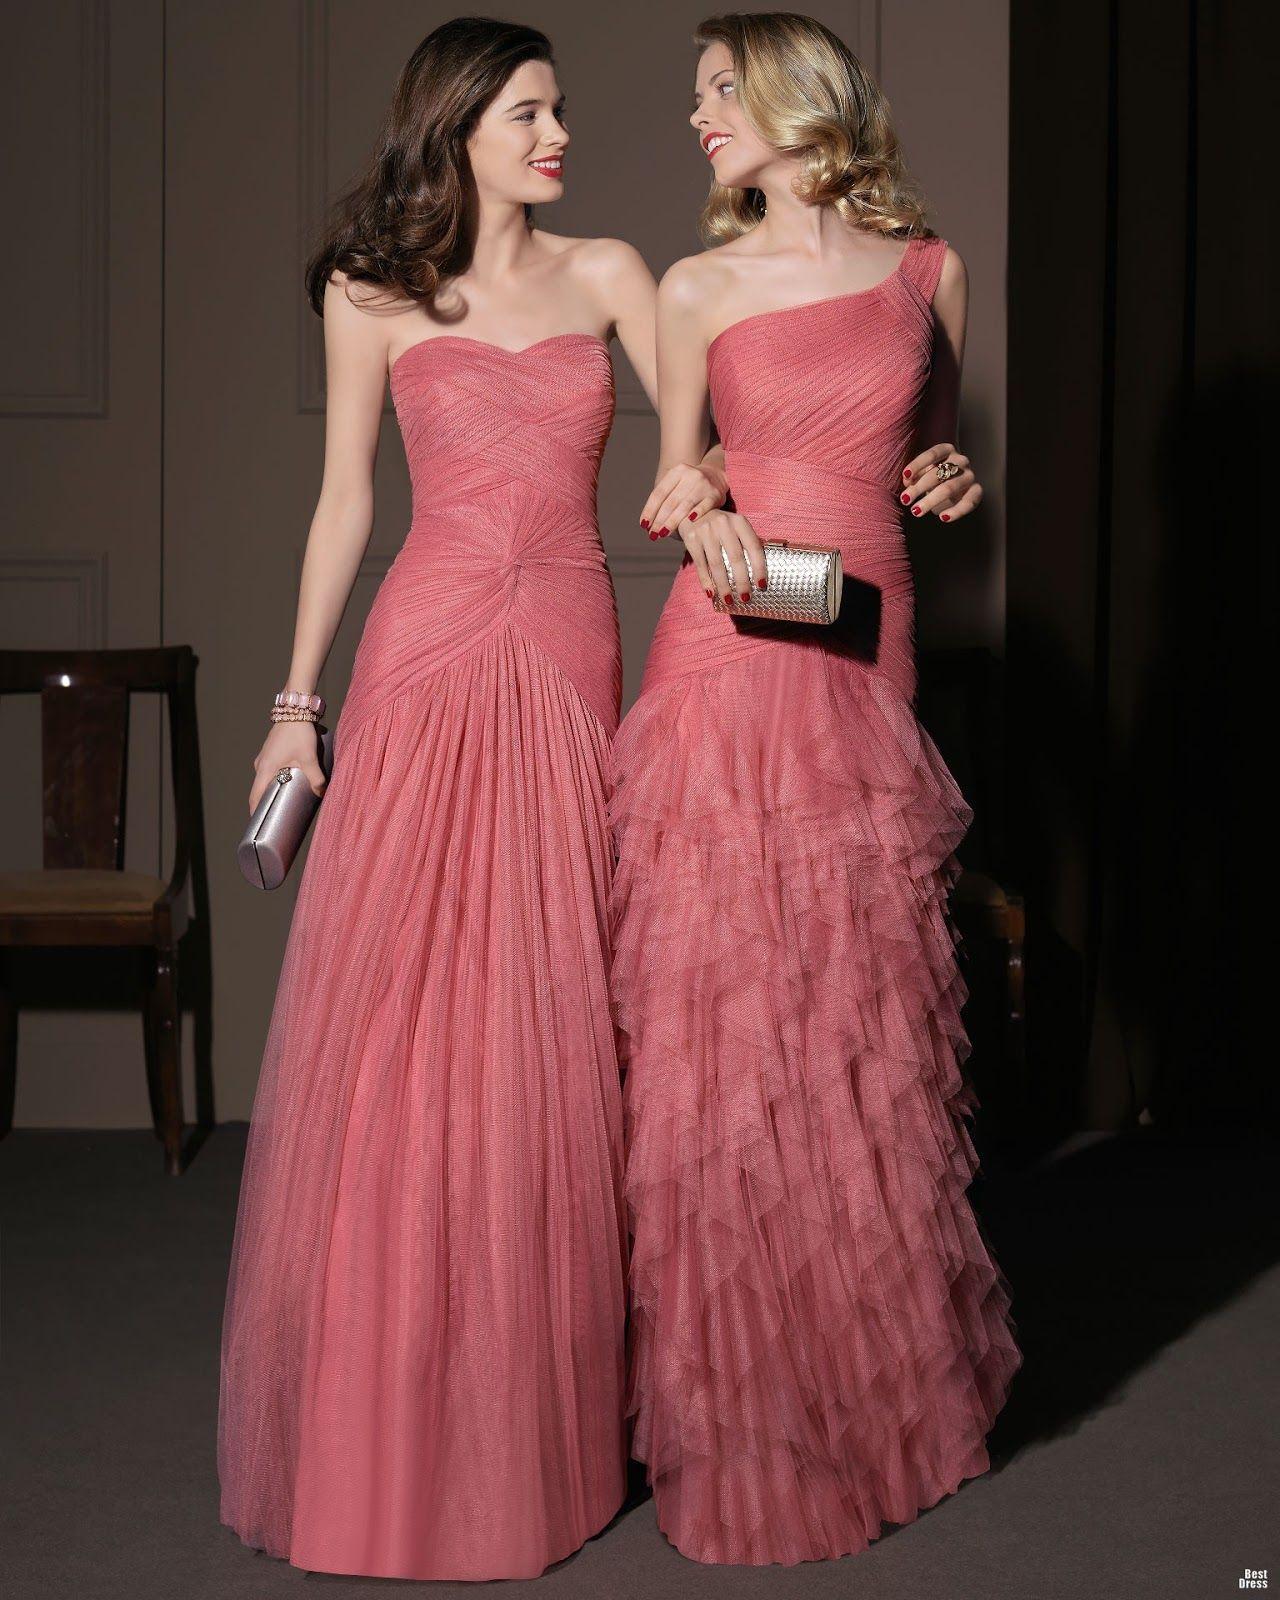 Moda y vestidos largos | Alta Costura | Pinterest | Vestido largo ...